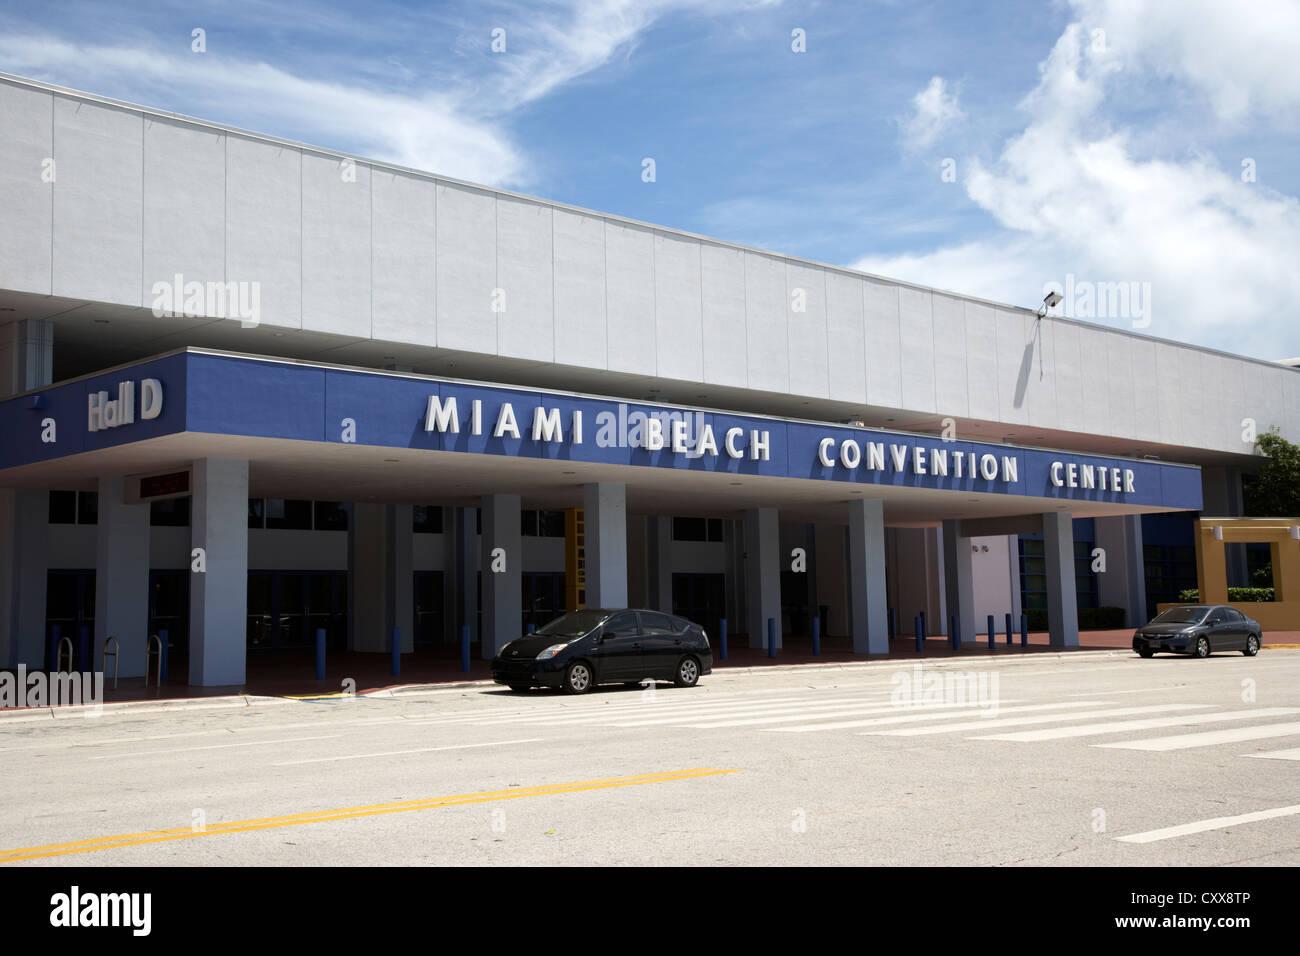 miami beach convention center miami south beach florida usa Stock Photo